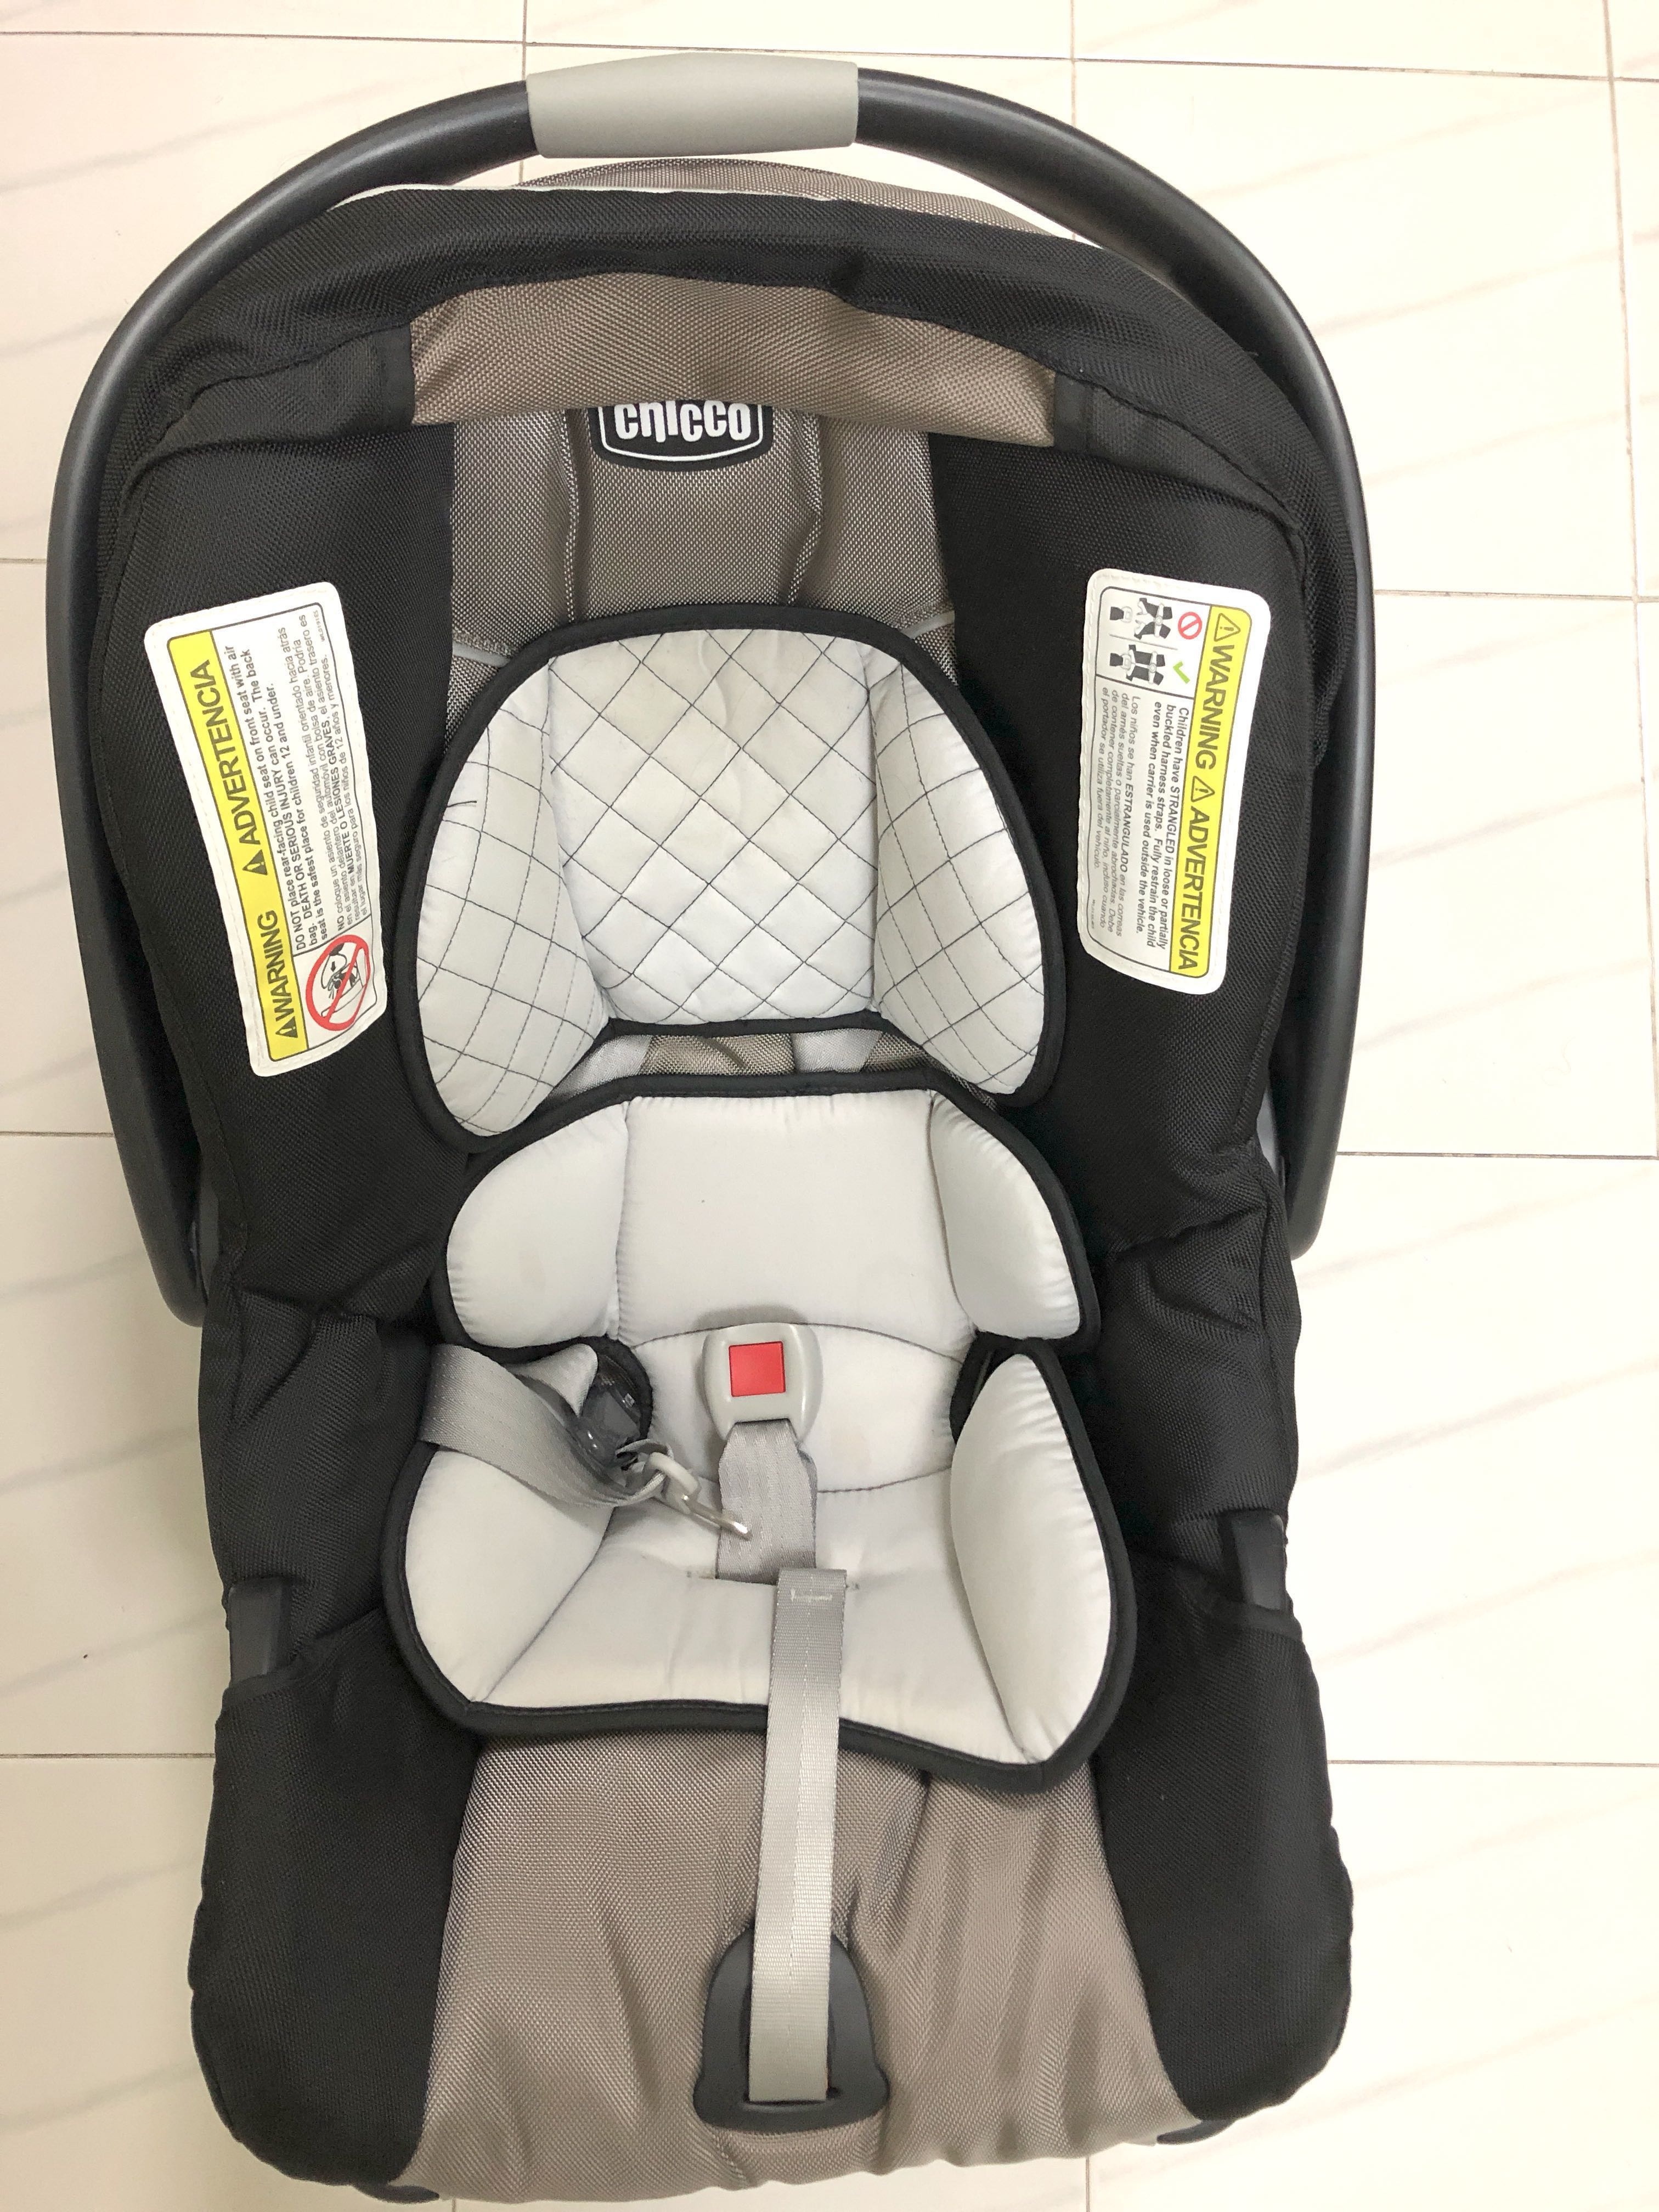 Chicco Keyfit 30 Infant Car Seat Base